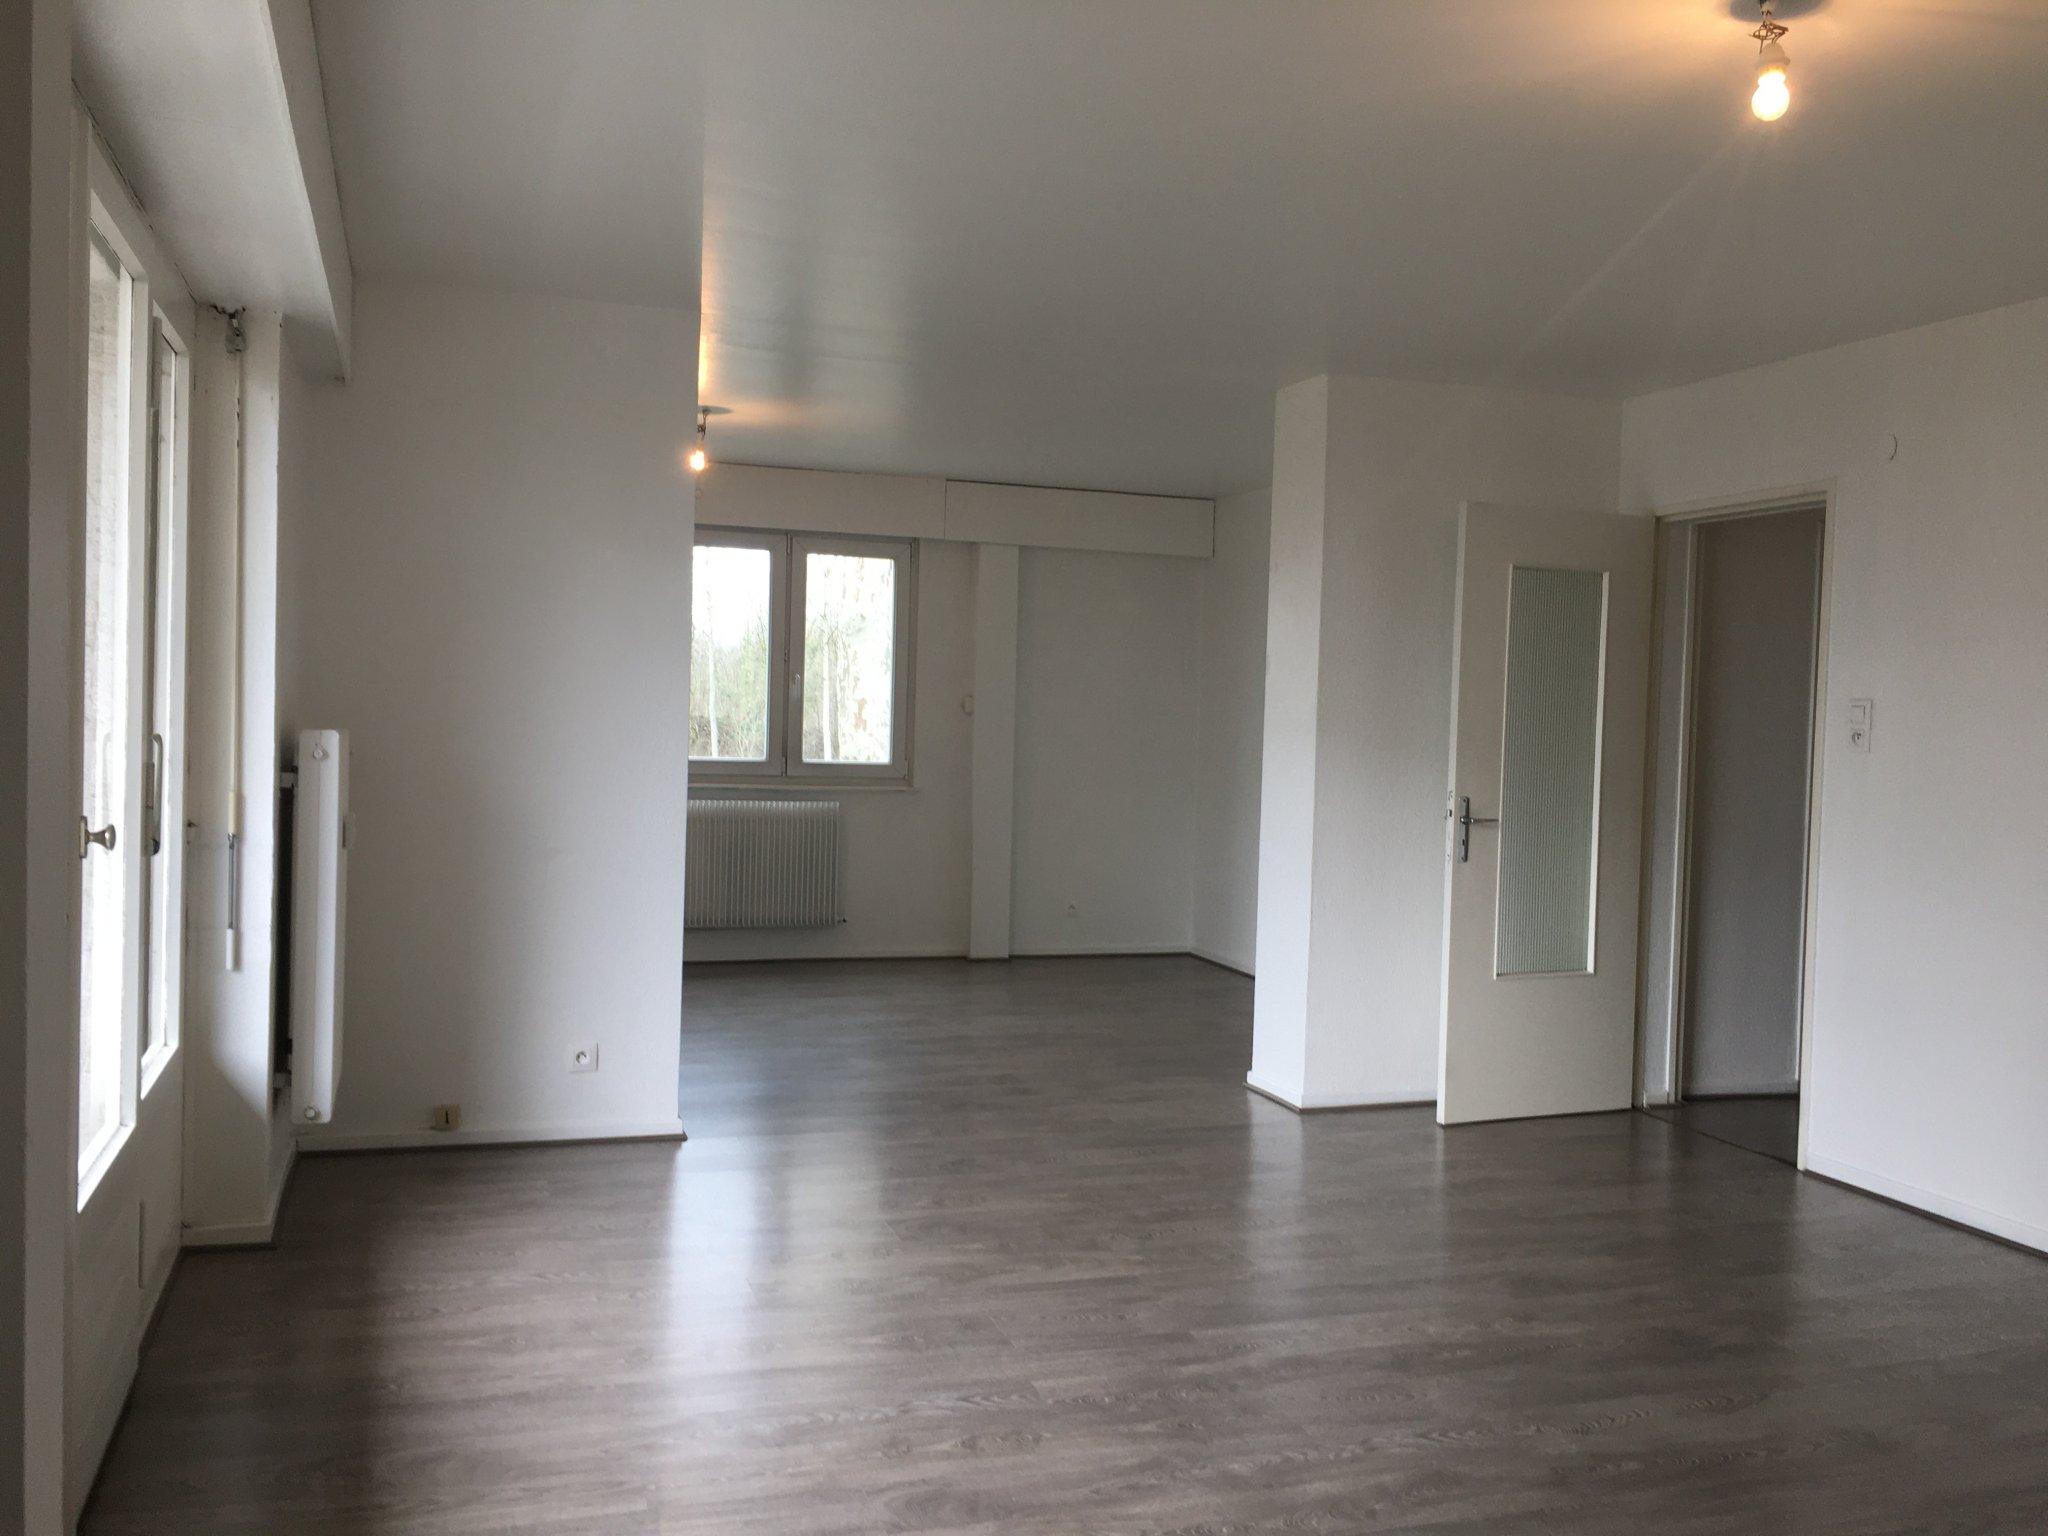 Appartement - Illkirch-Graffenstaden